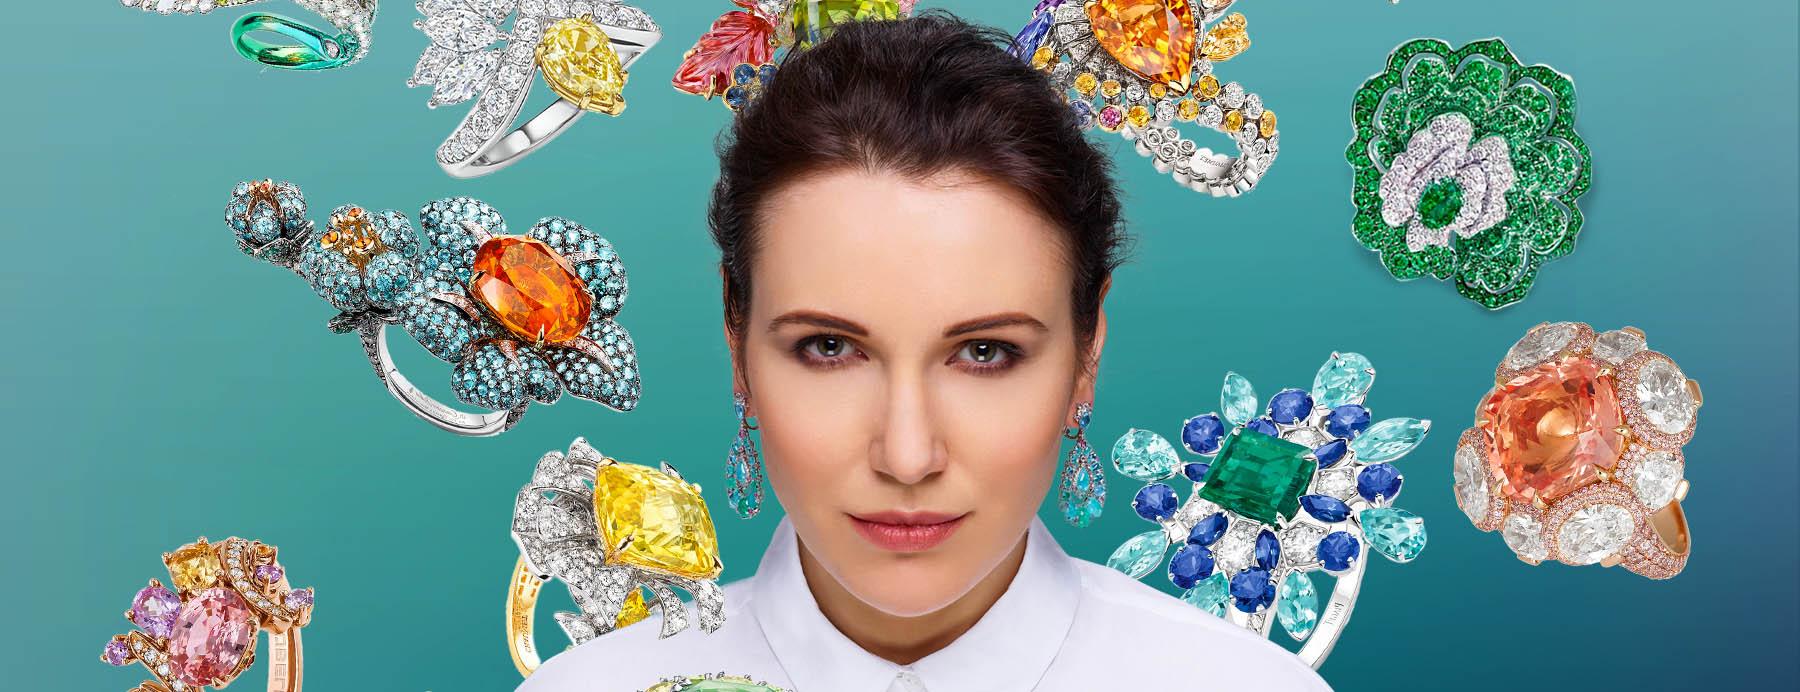 Jewellery influencer Katerina Perez